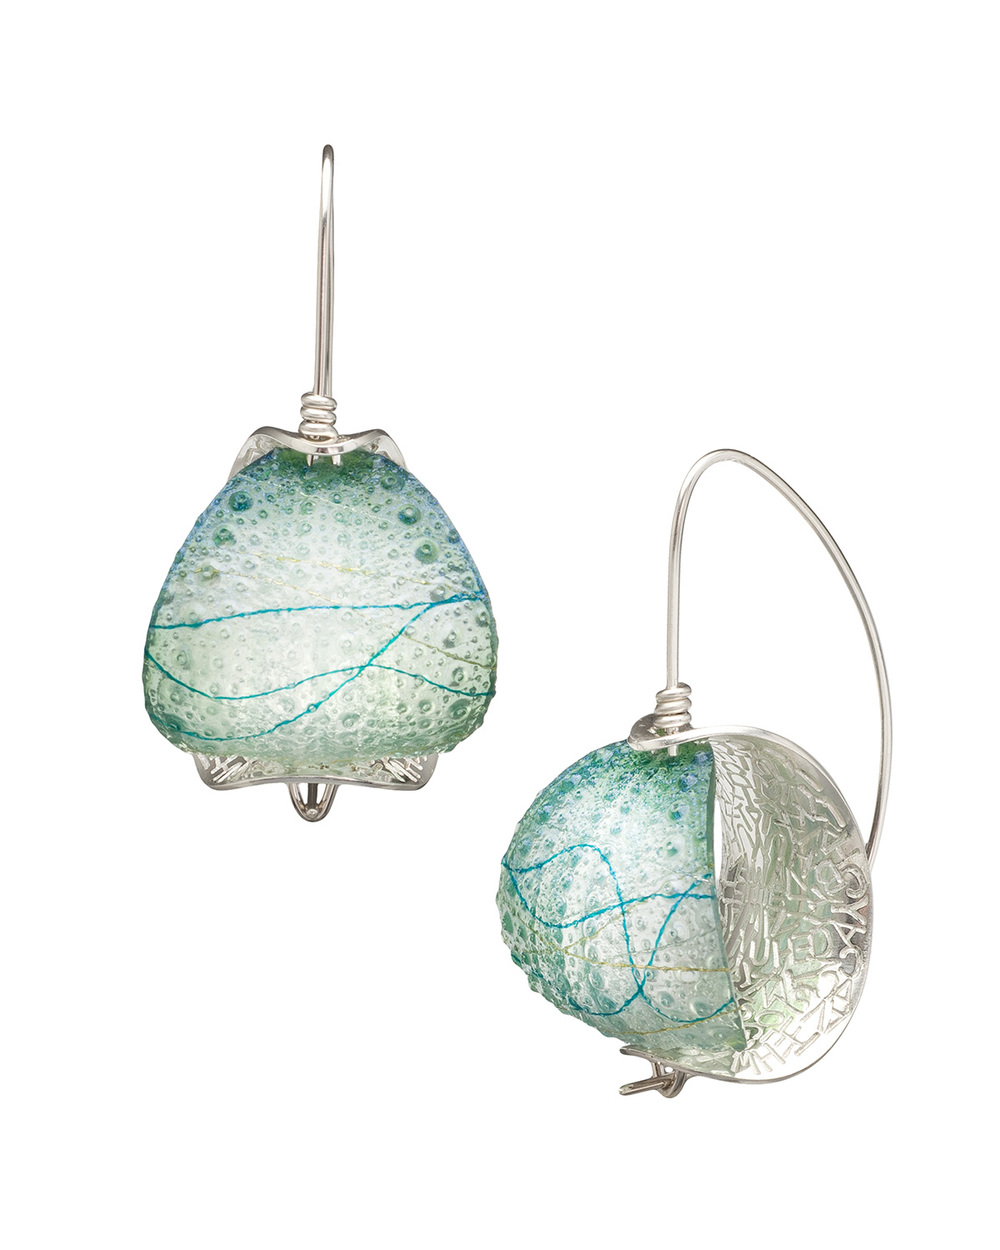 2015-08-27-Mary-Lynn-Podiluk-Retroflex-Earrings-10a.jpg